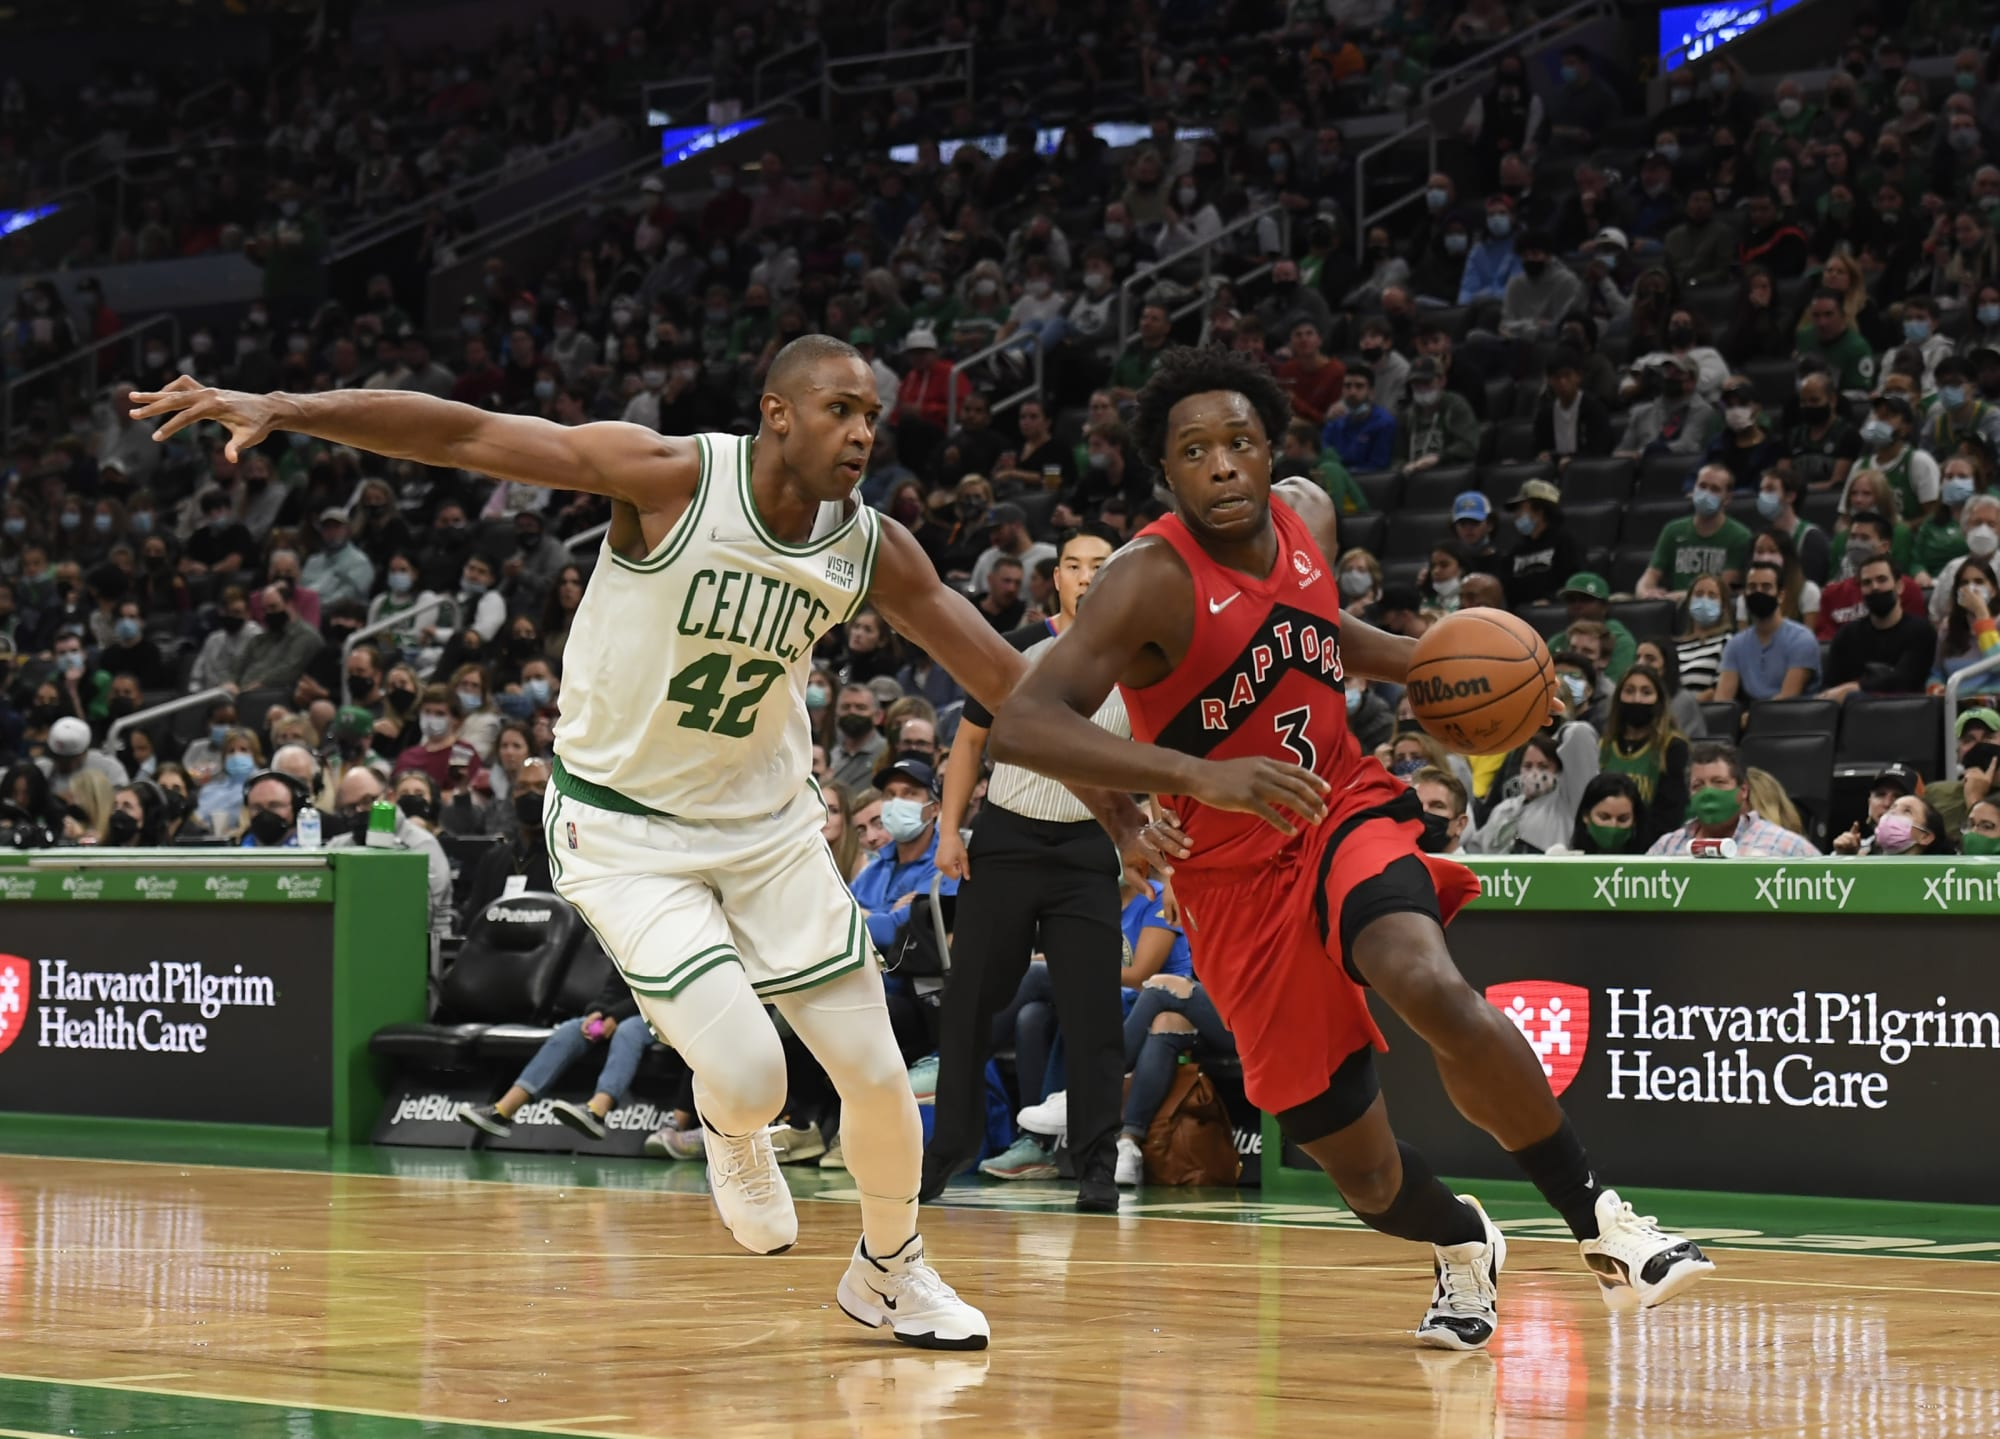 Raptors: Fred VanVleet confirms OG Anunoby is top offensive option